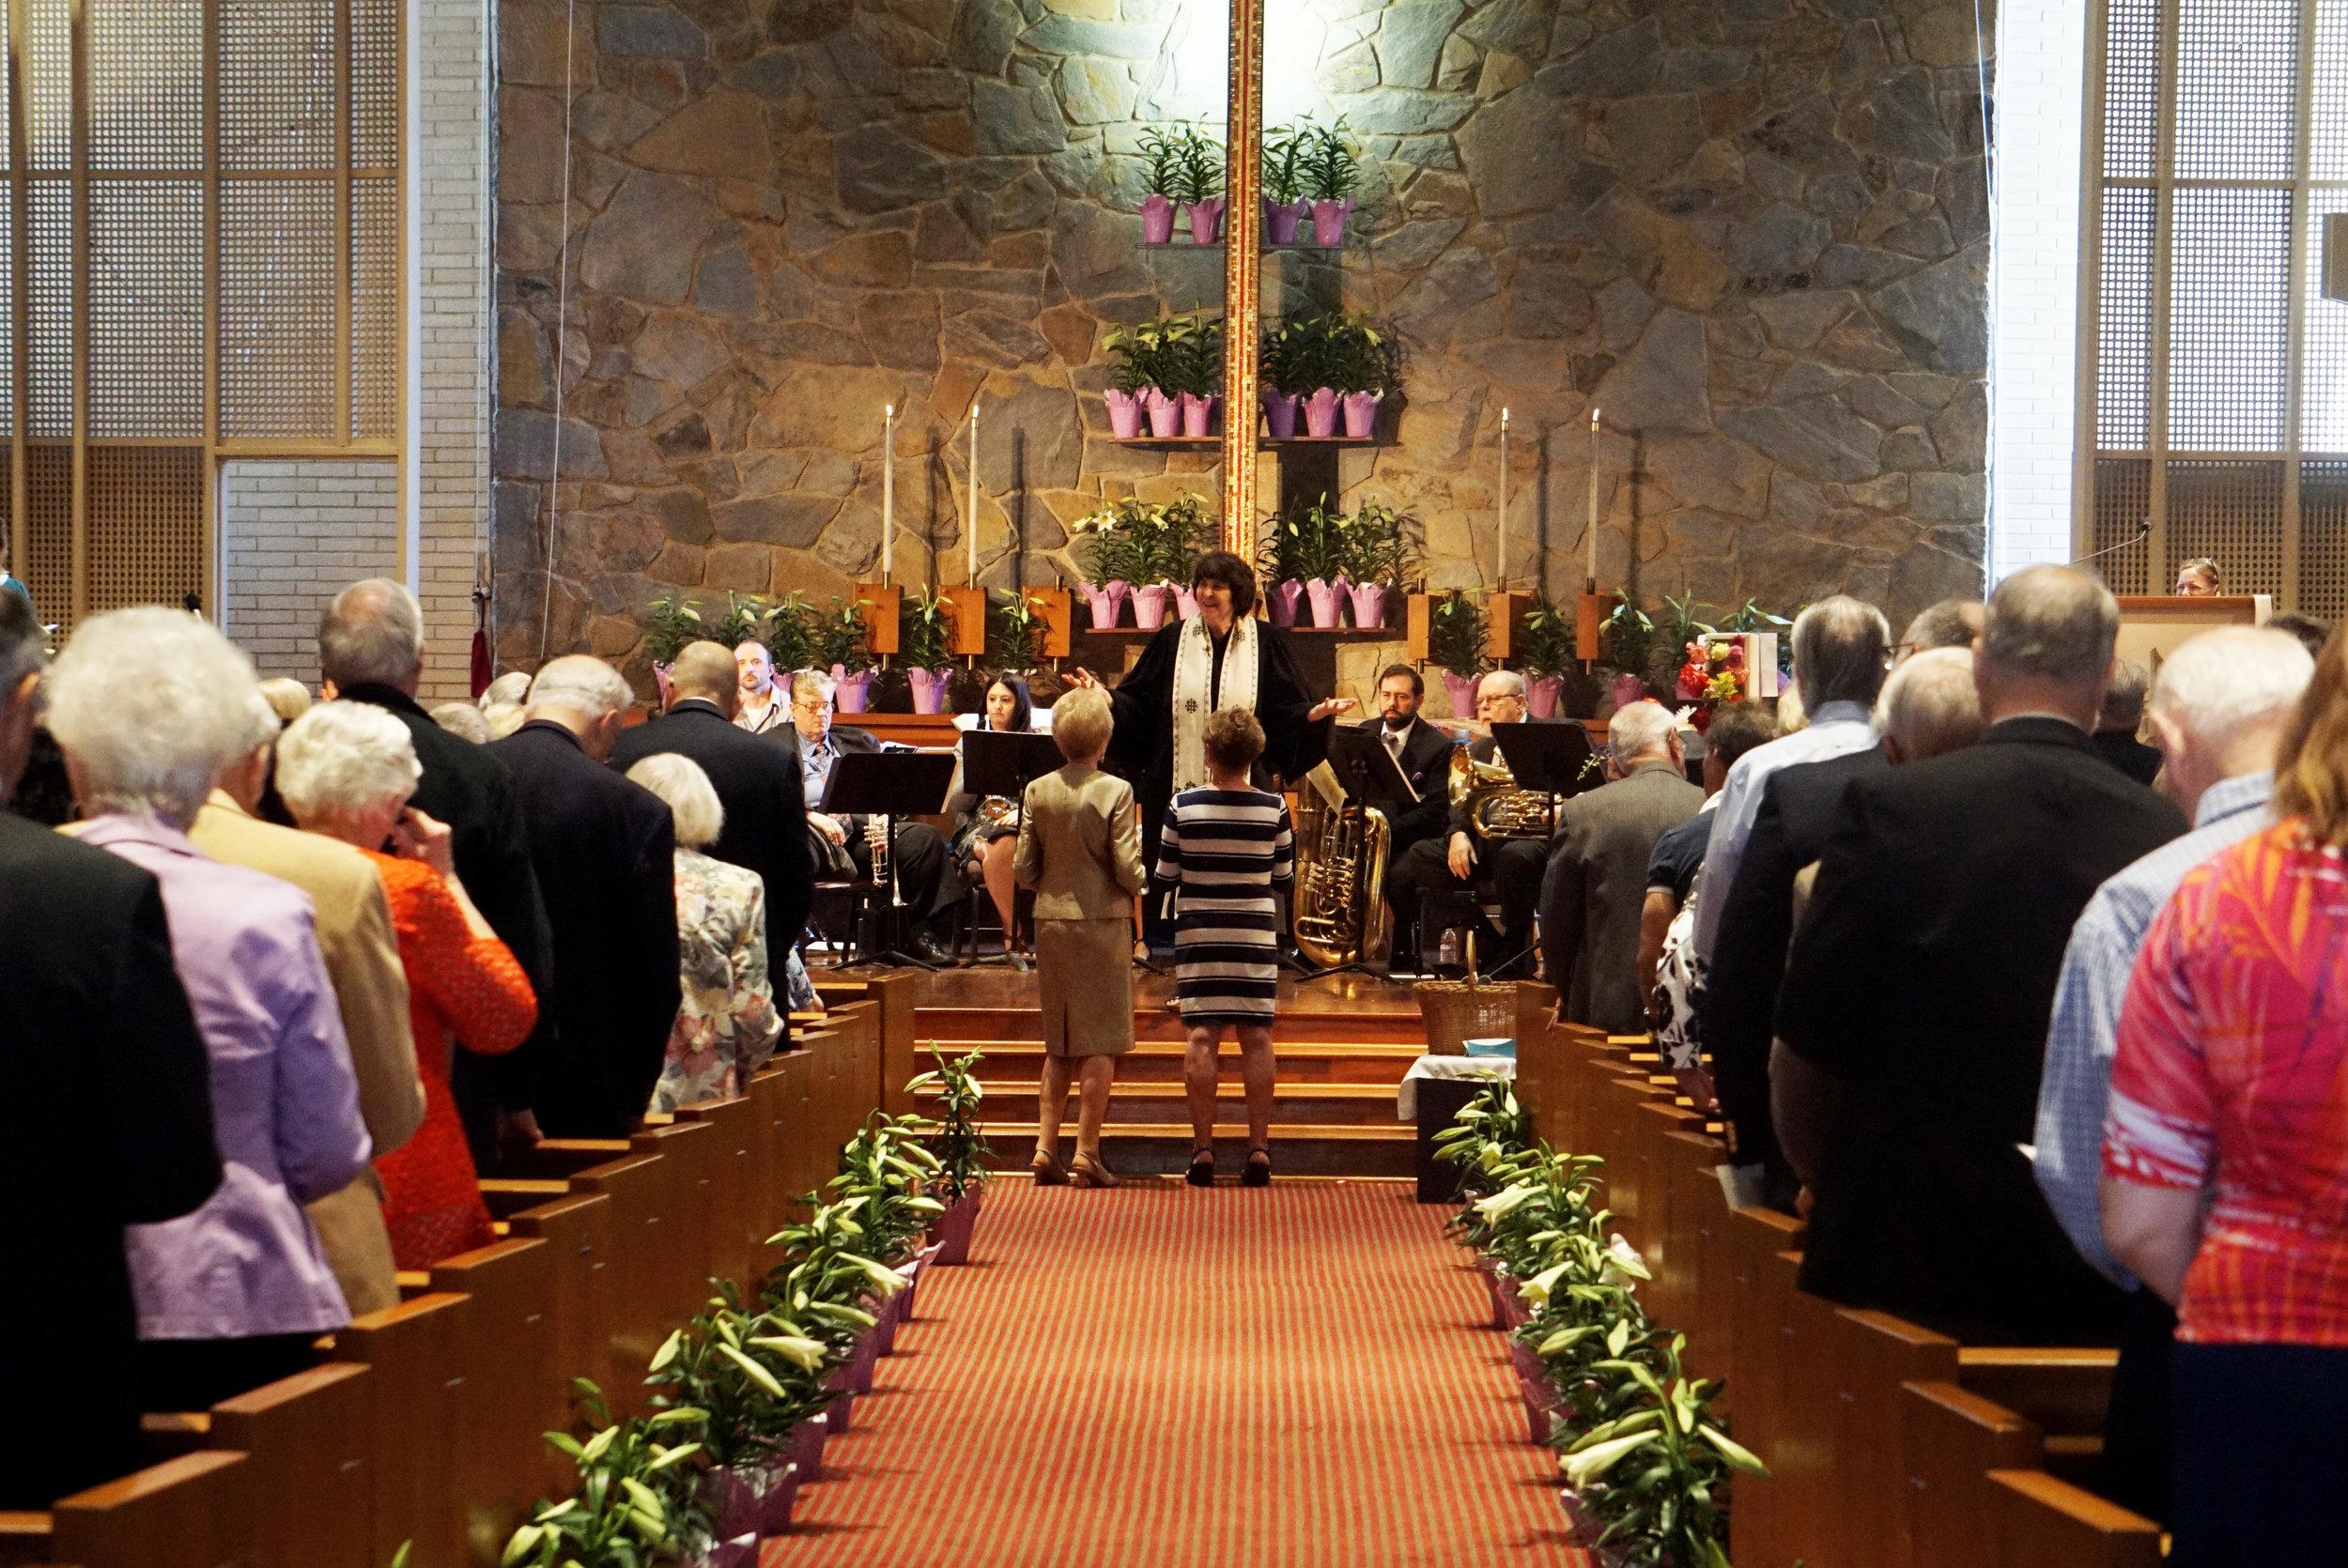 claremont-presbyterian-church-service-sanctuary-congregation-2.jpg